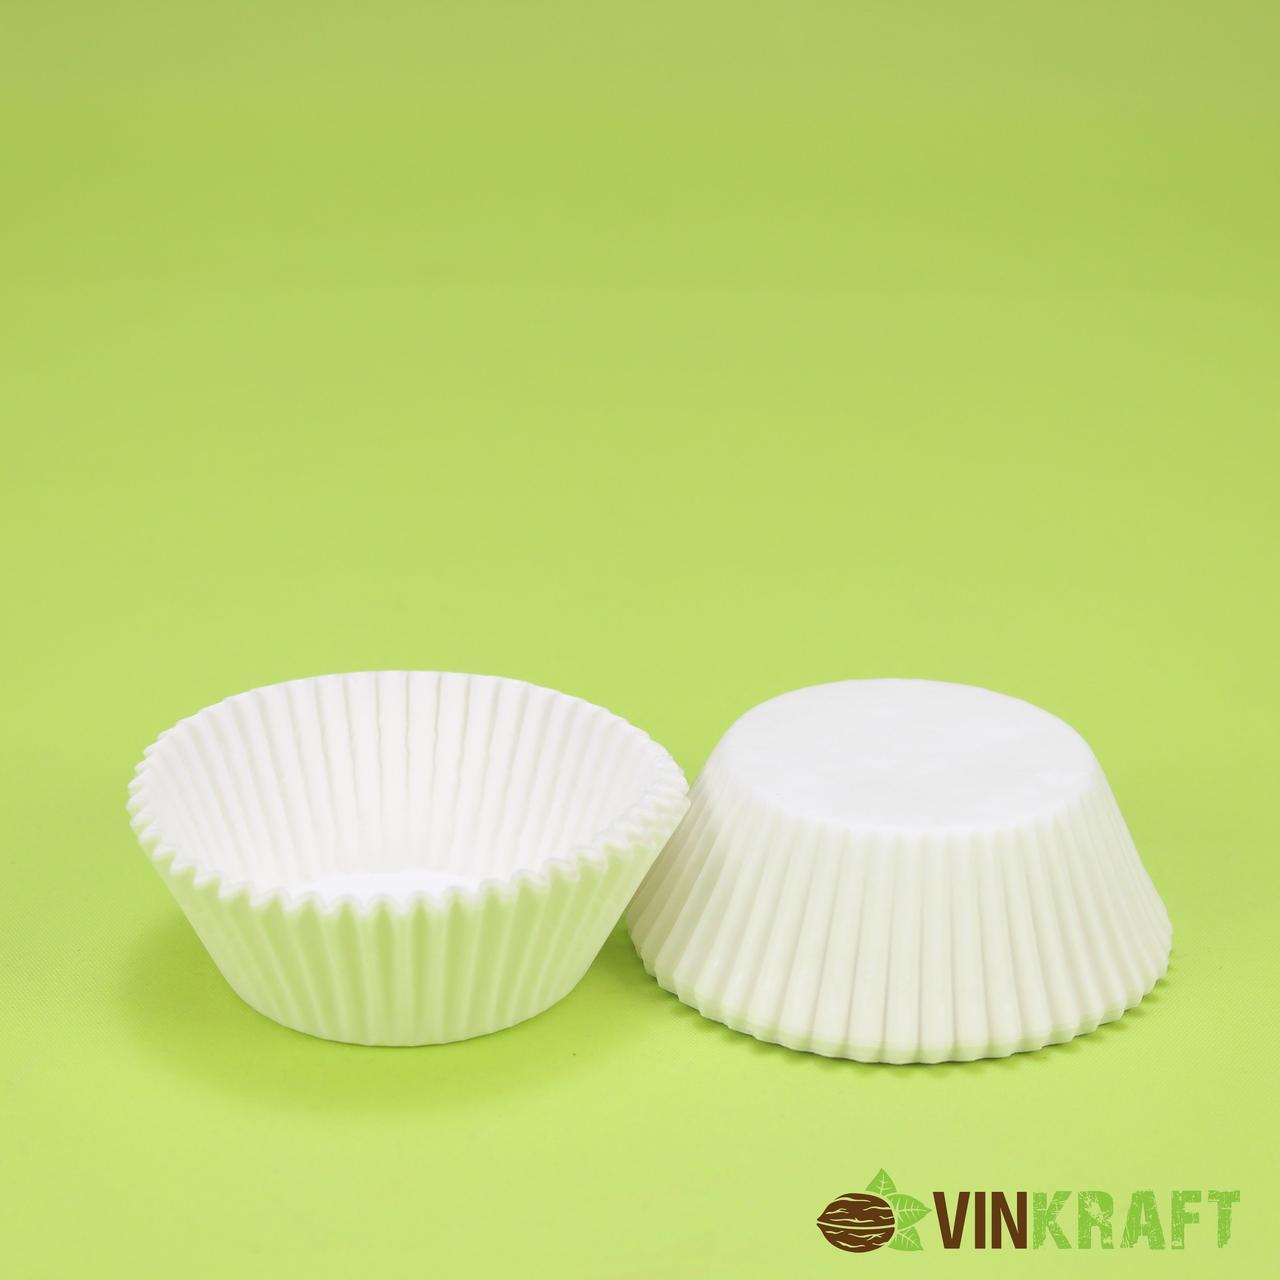 Паперова форма для кексів 7а (50х30), белая (грюн)